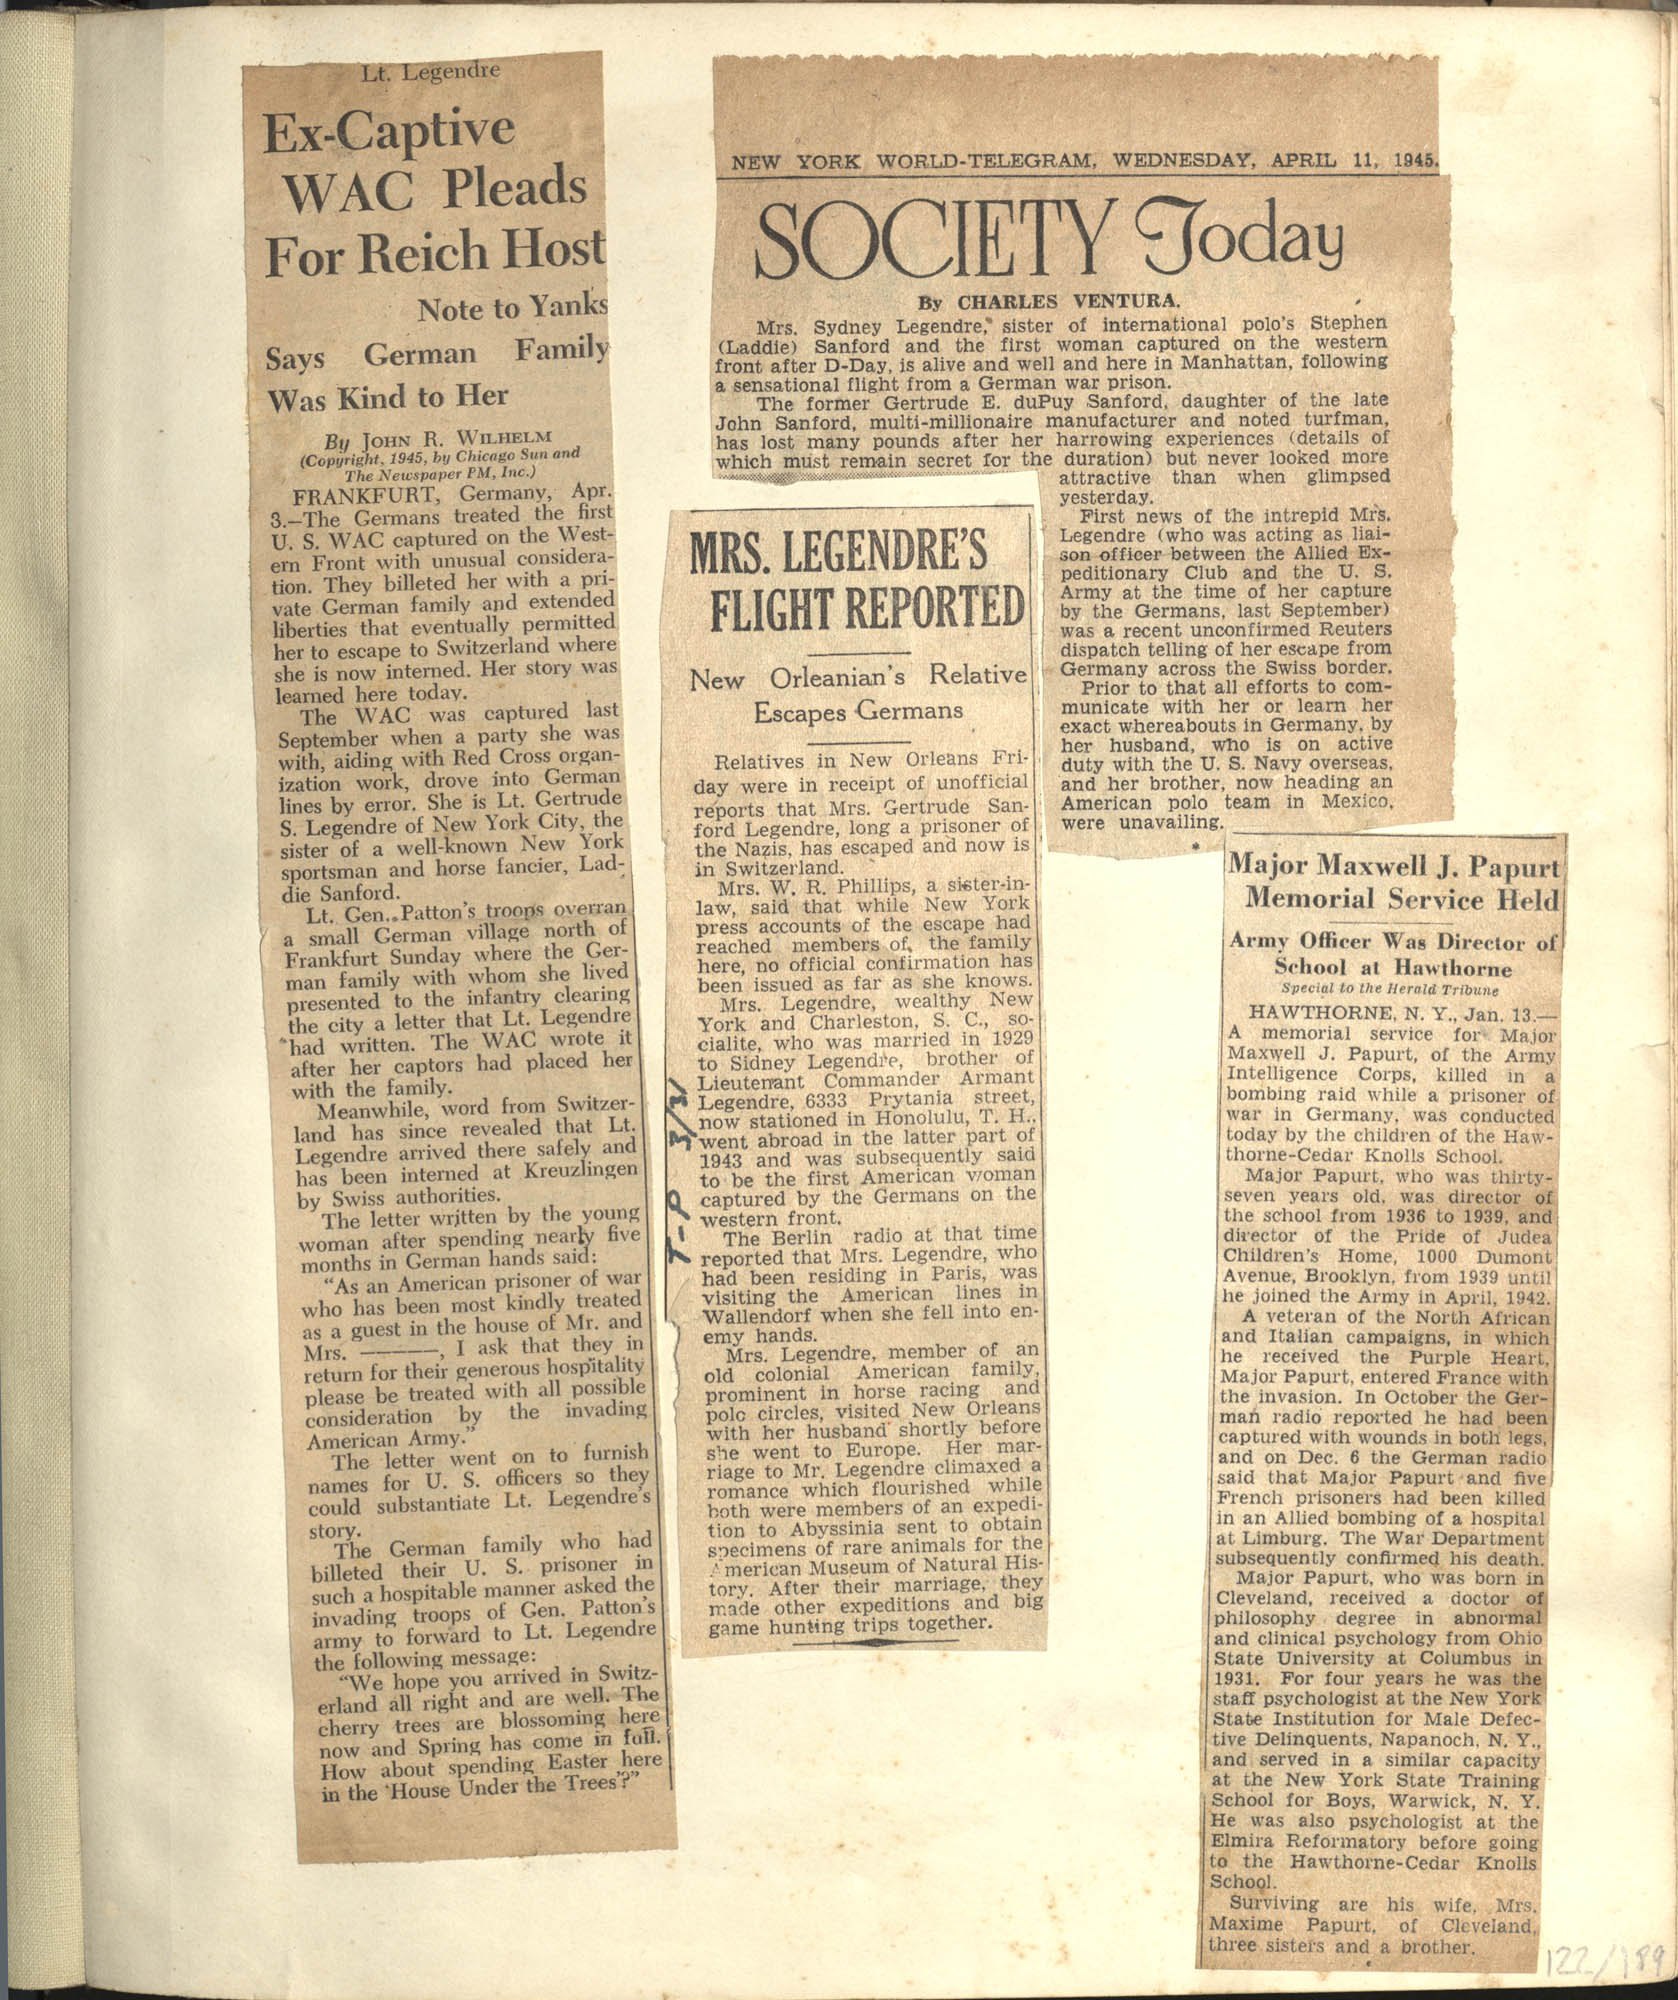 Gertrude Legendre OSS Scrapbook, 1944, Page 122